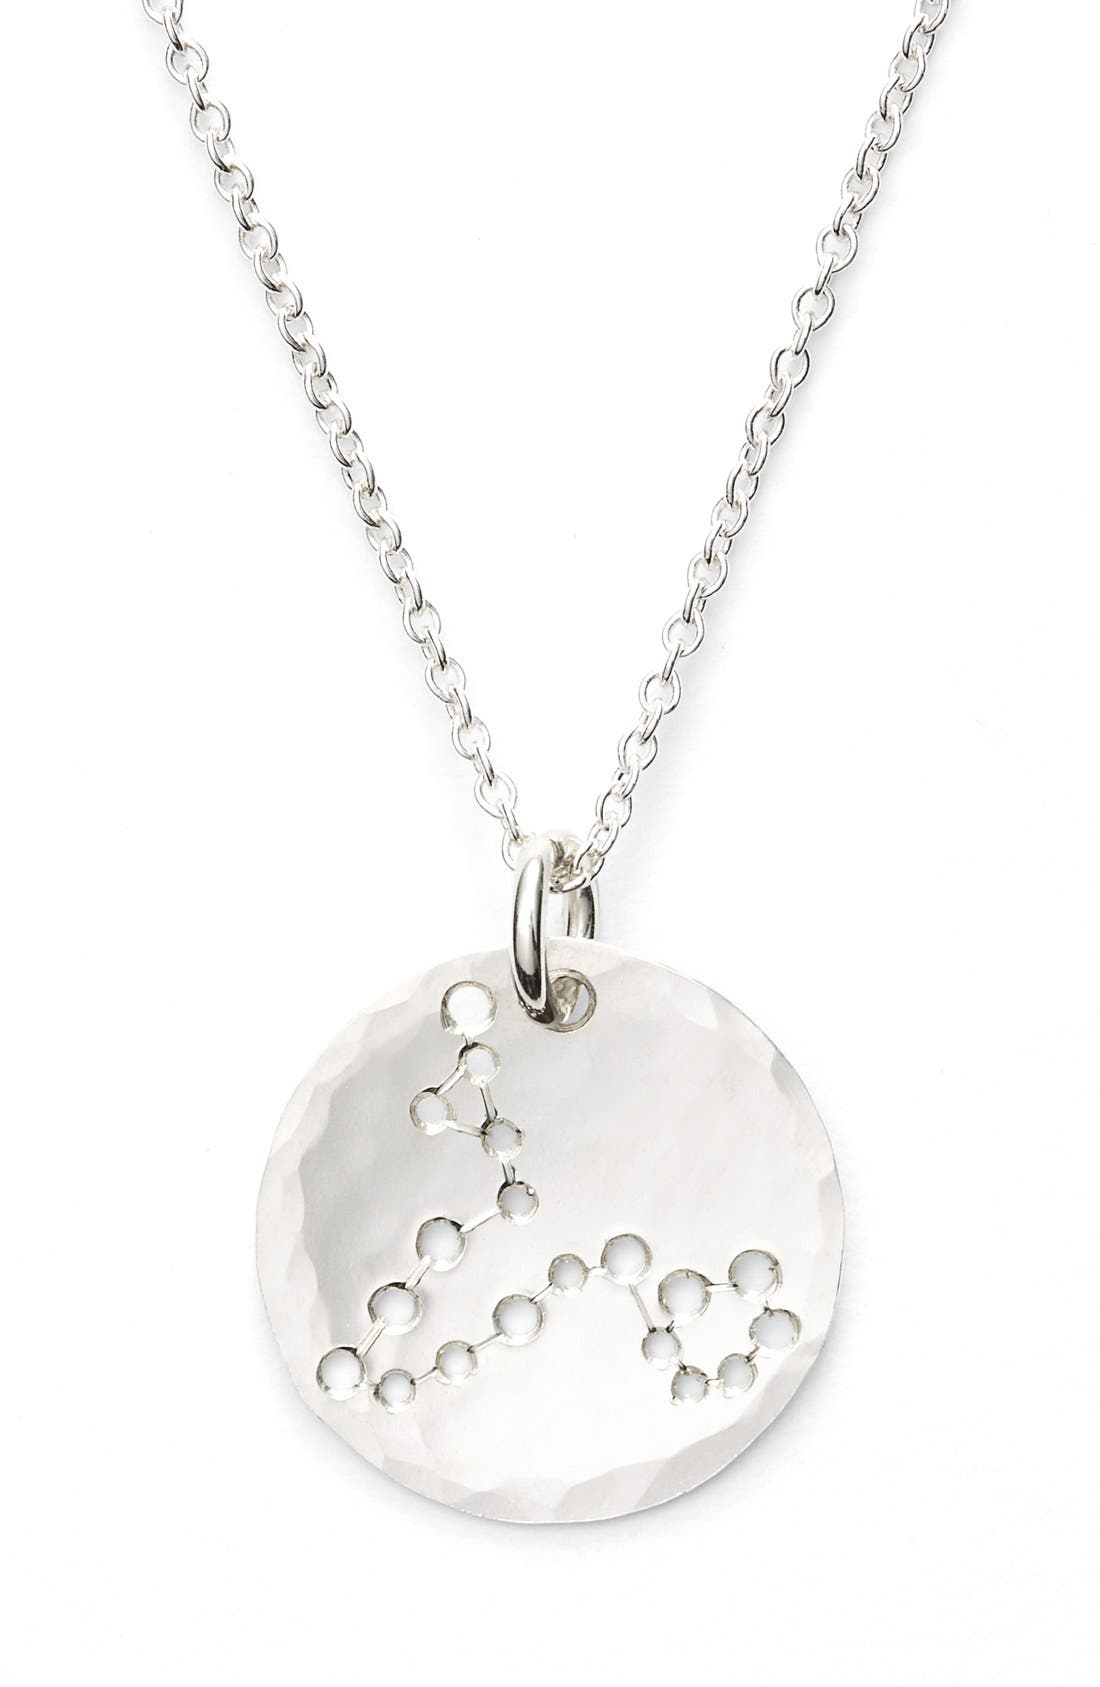 Ija 'Small Zodiac' Sterling Silver Necklace,                             Alternate thumbnail 13, color,